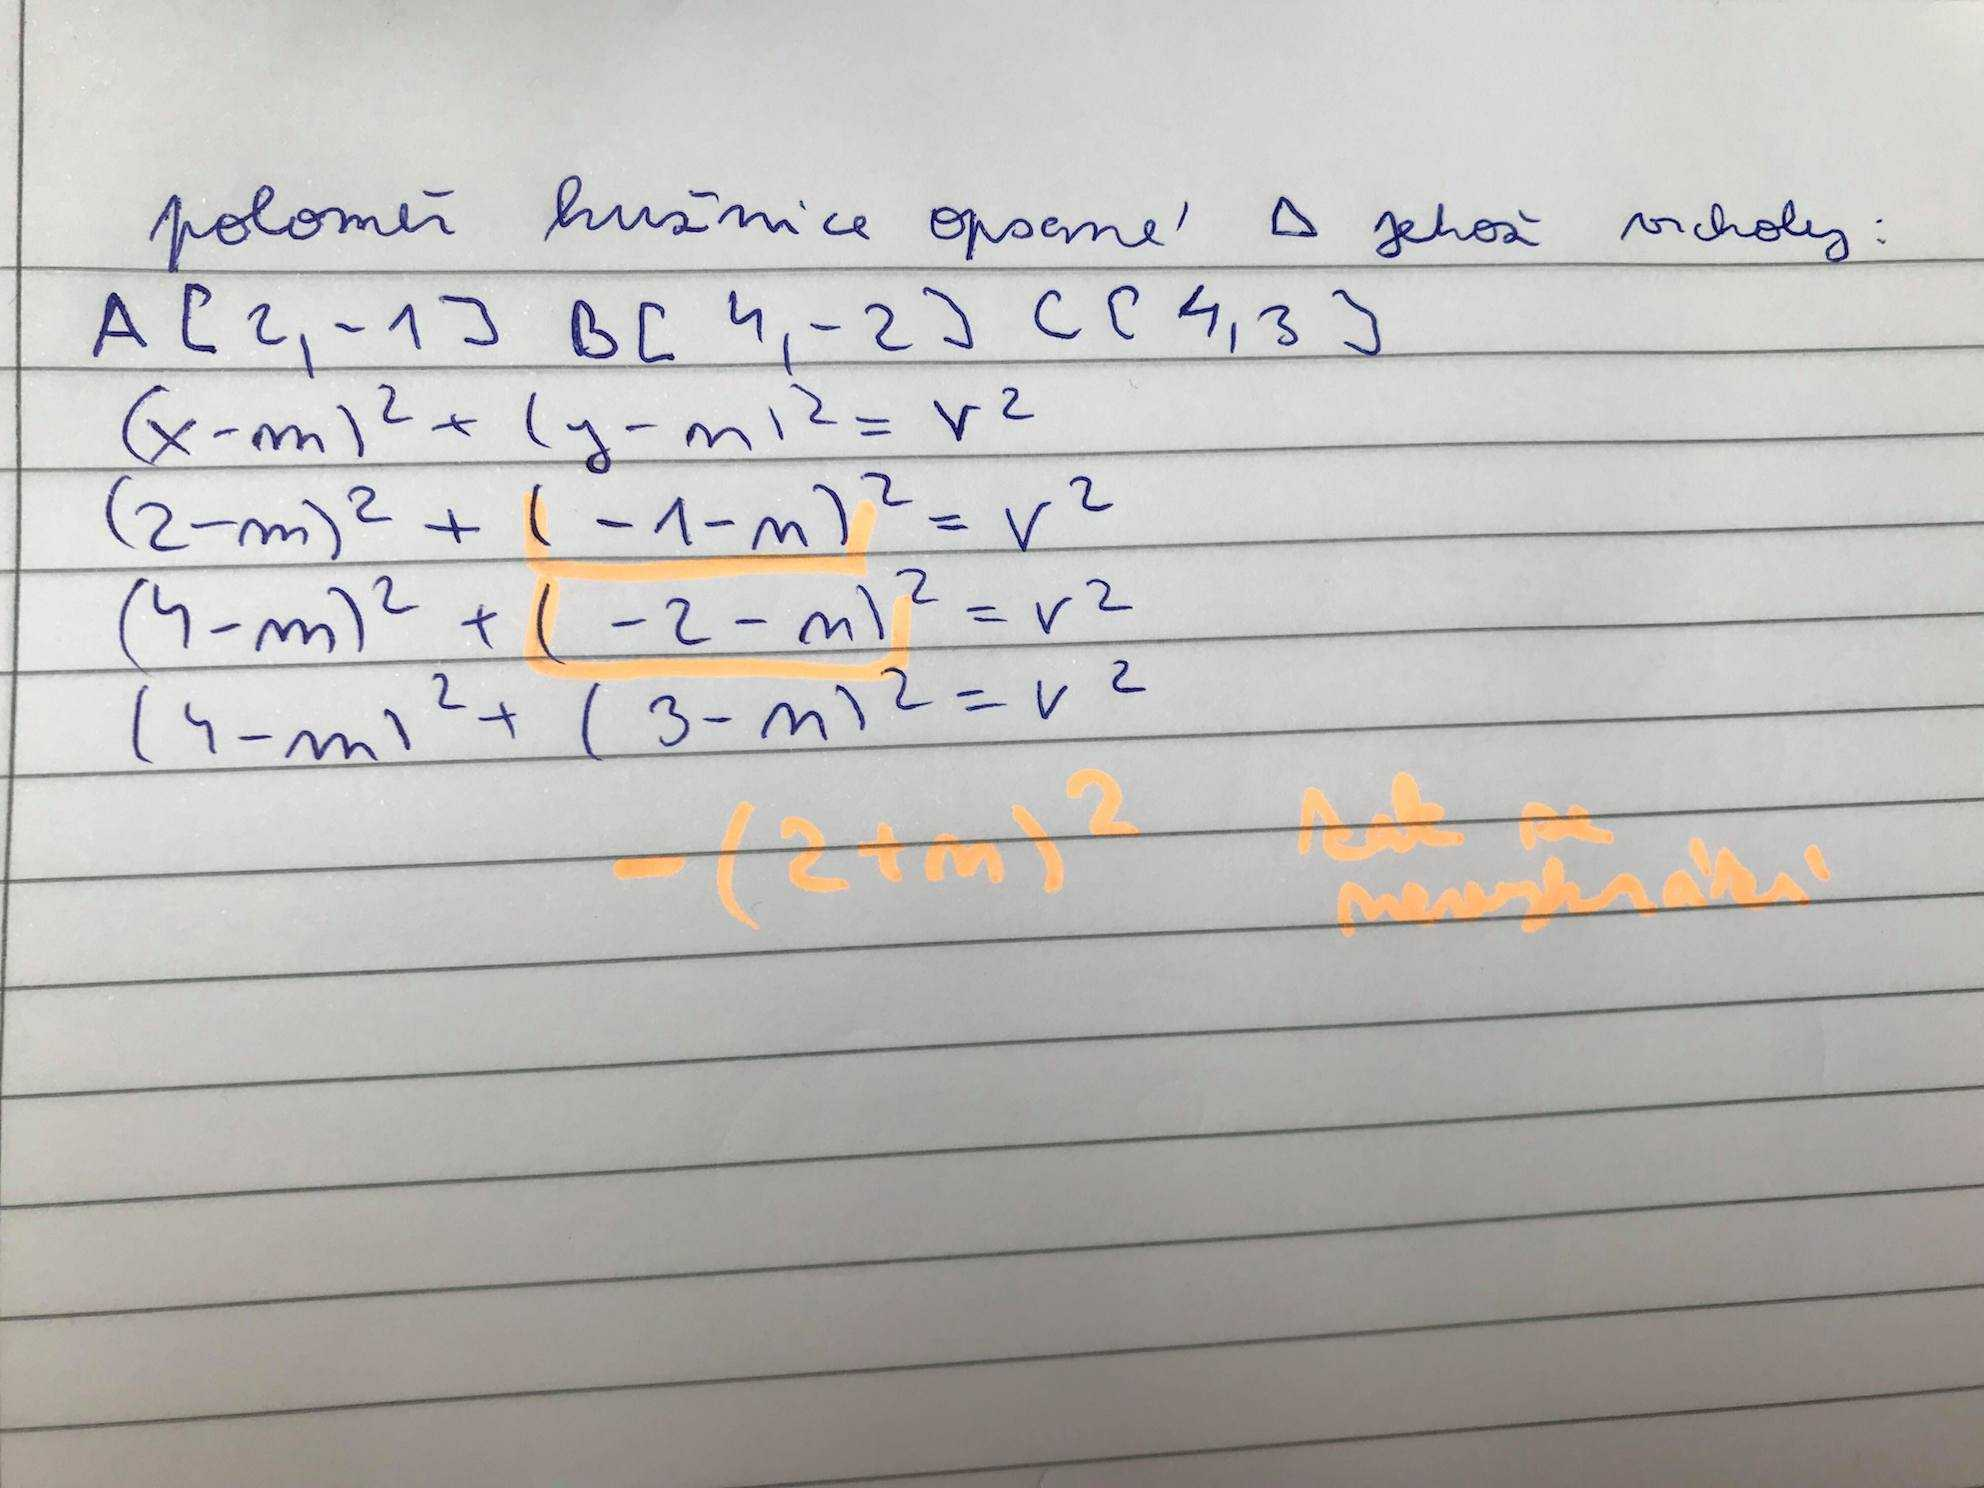 http://forum.matematika.cz/upload3/img/2018-06/39940_34885678_1084077618396602_8728255366682378240_n.jpg